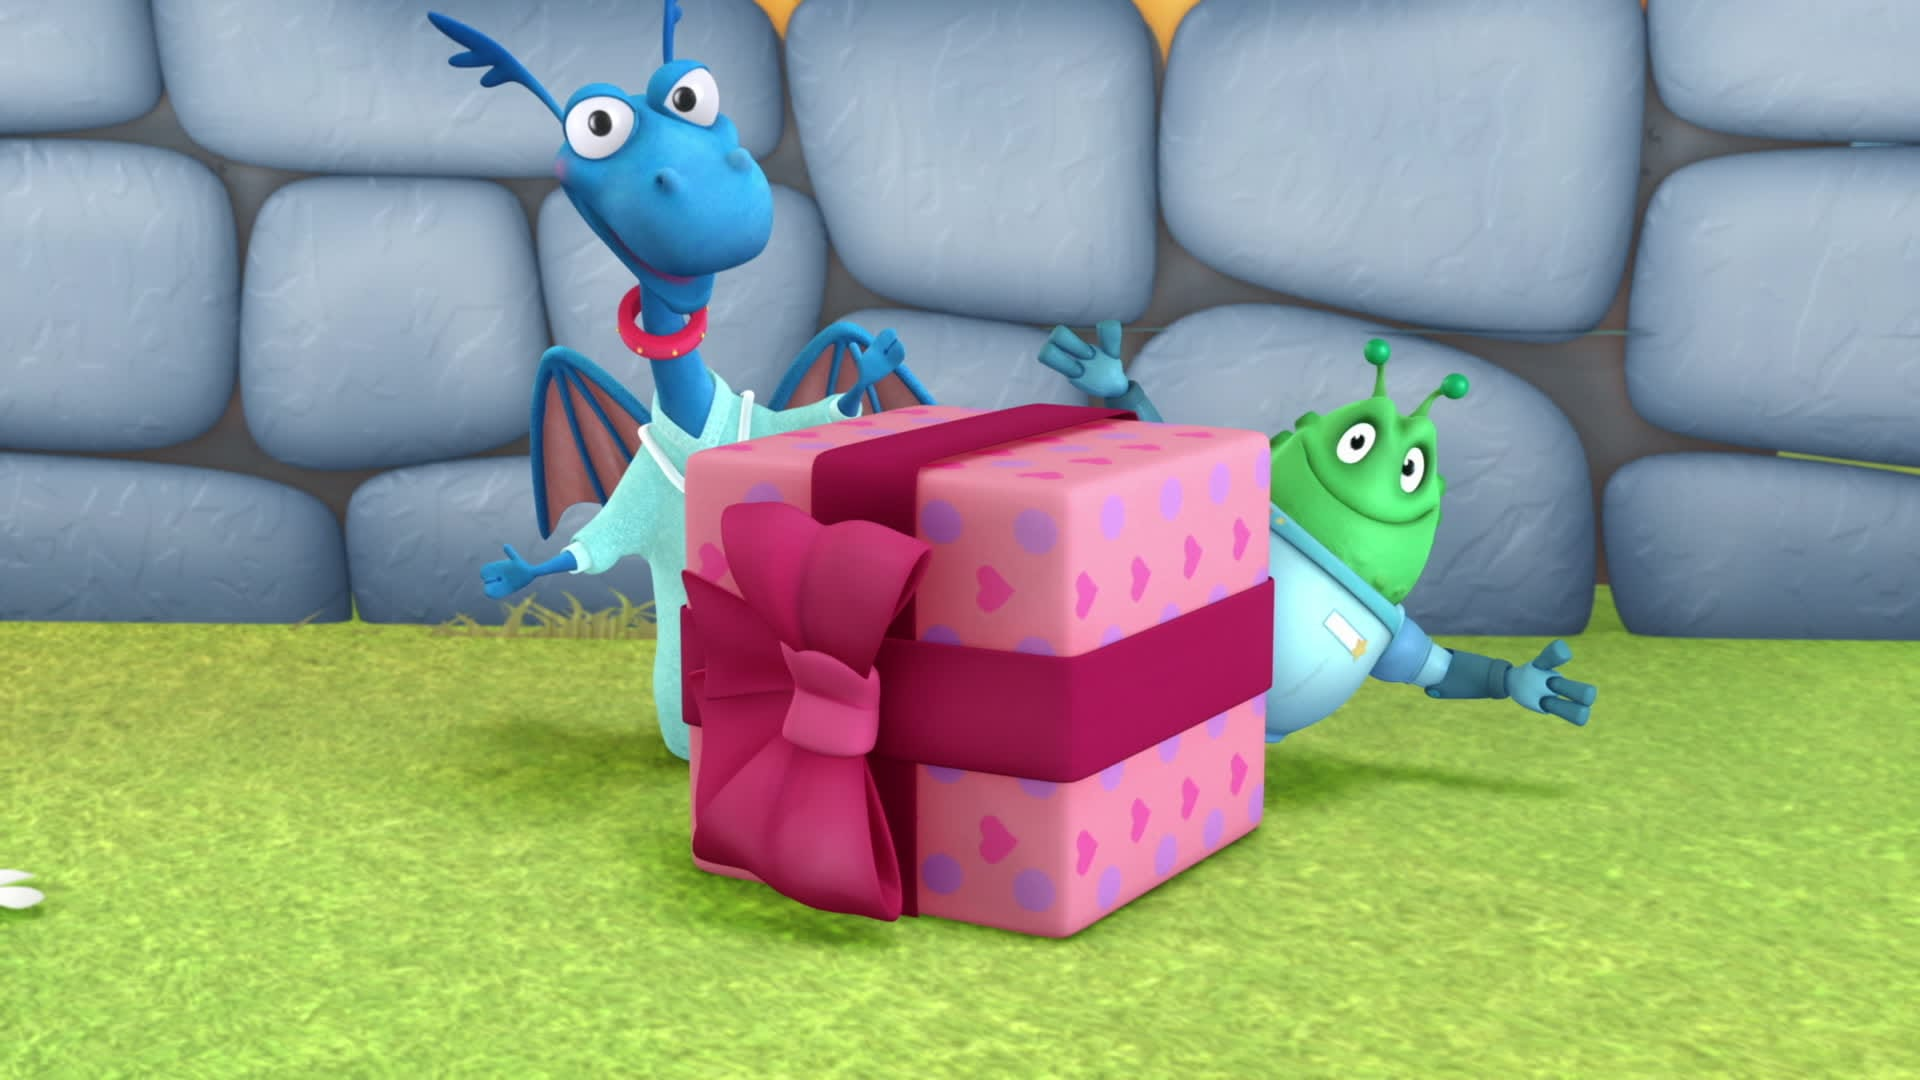 Dora Birthday Cake Decorations Image Inspiration of Cake and